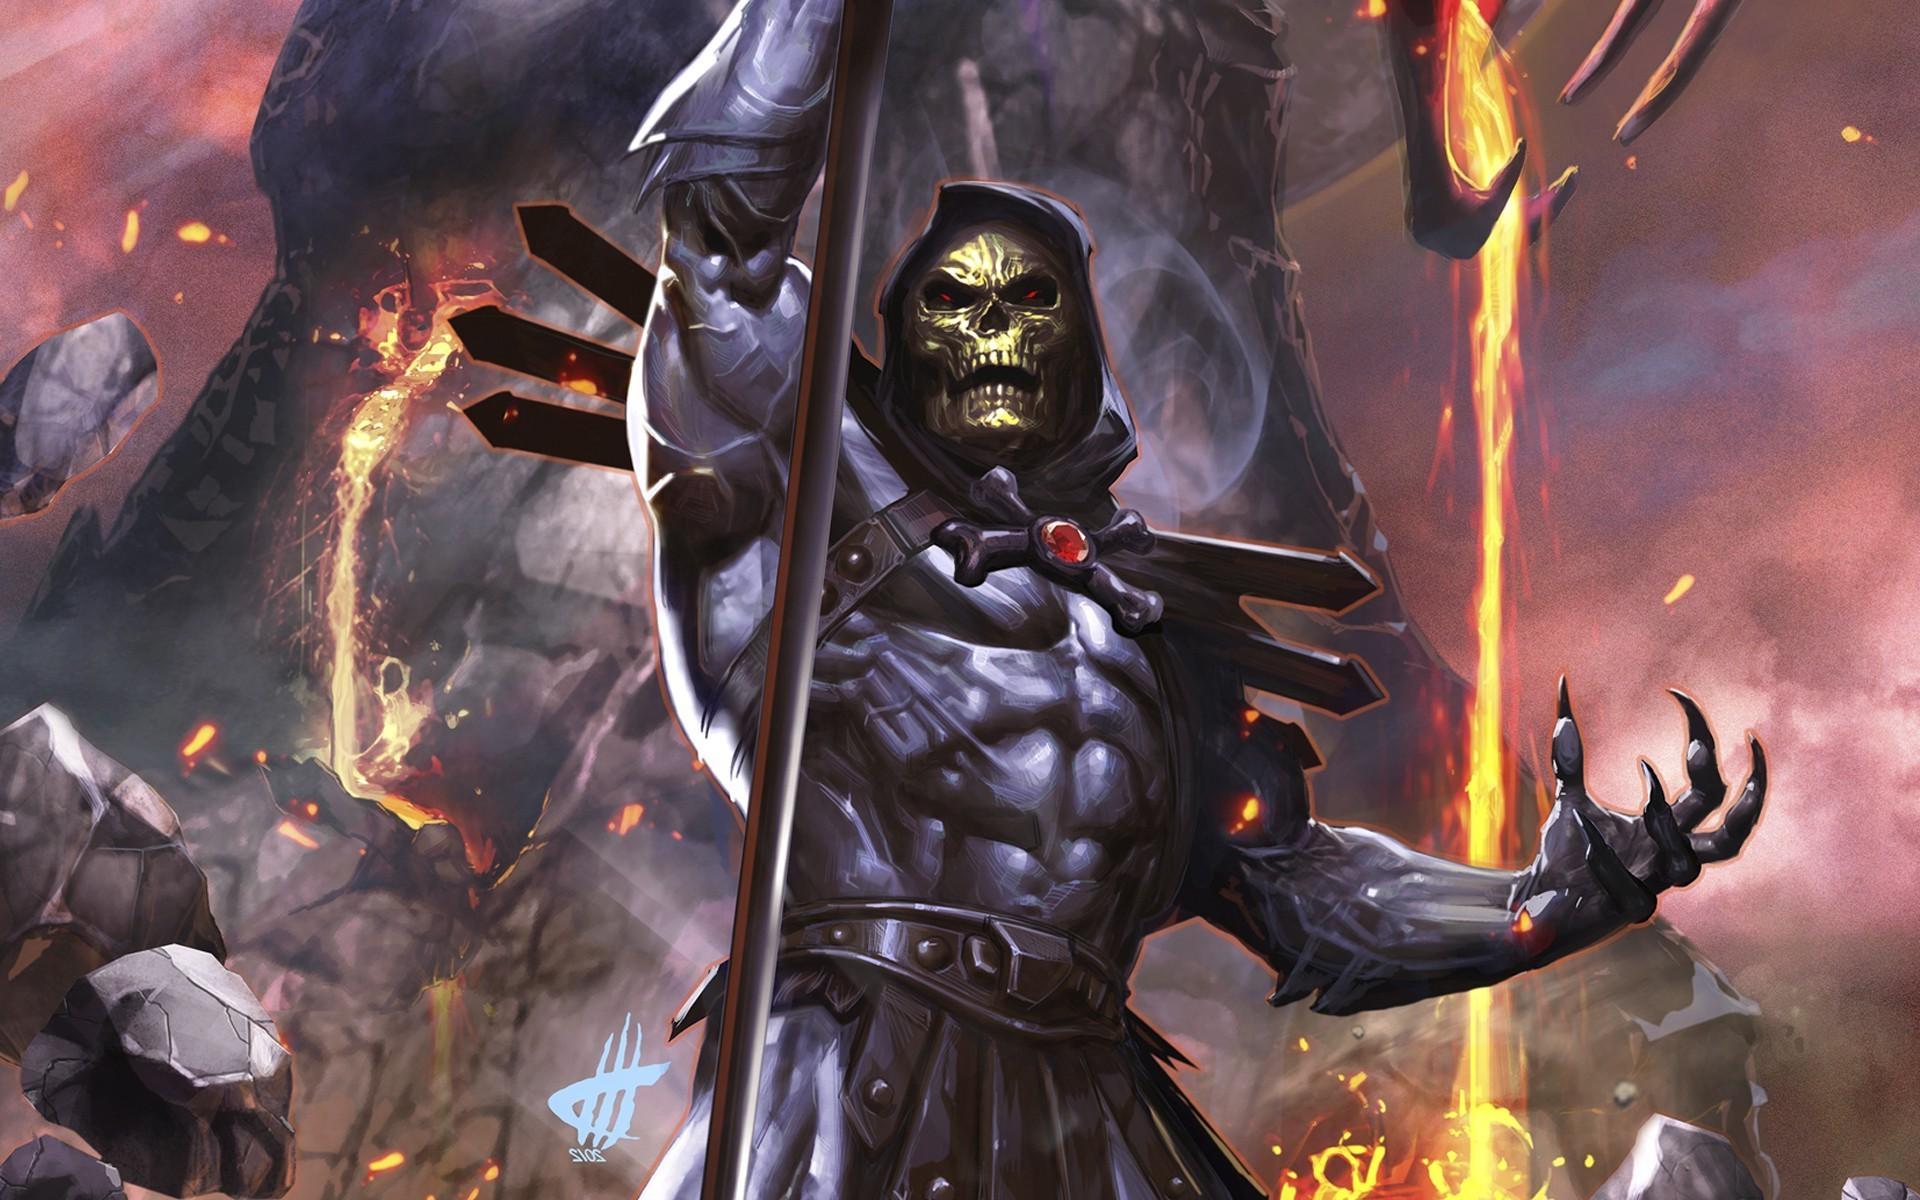 Fantasy Art He Man Comics Skeletor Mythology Games Screenshot Warlord 1920x1200 Px Computer Wallpaper Pc Game